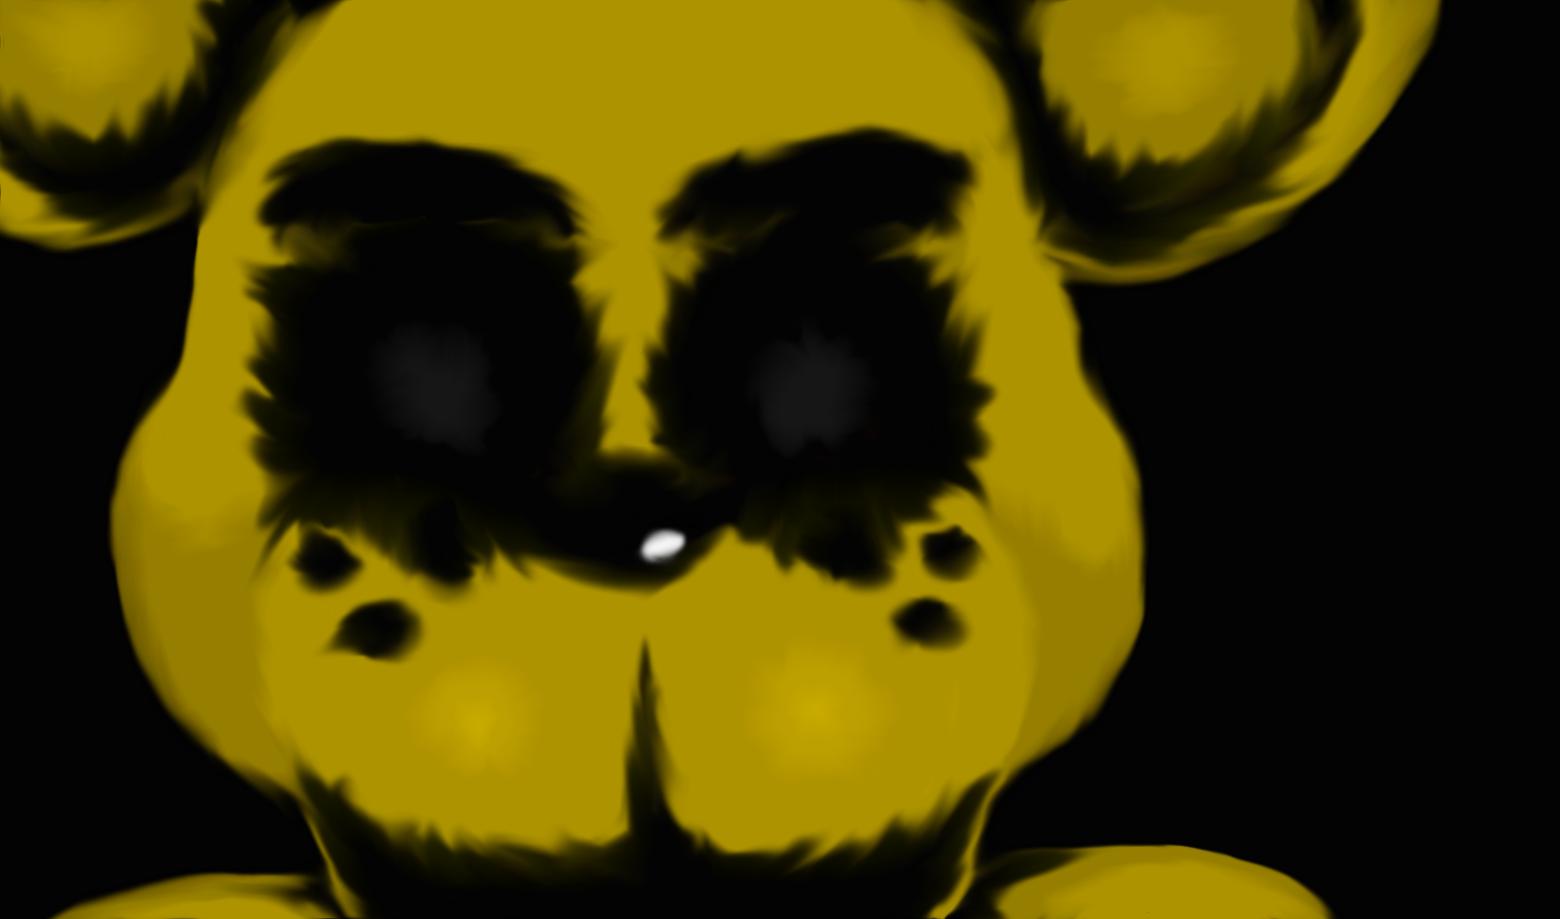 Death by golden Freddy back ground by Spazzygamergirl 1560x919